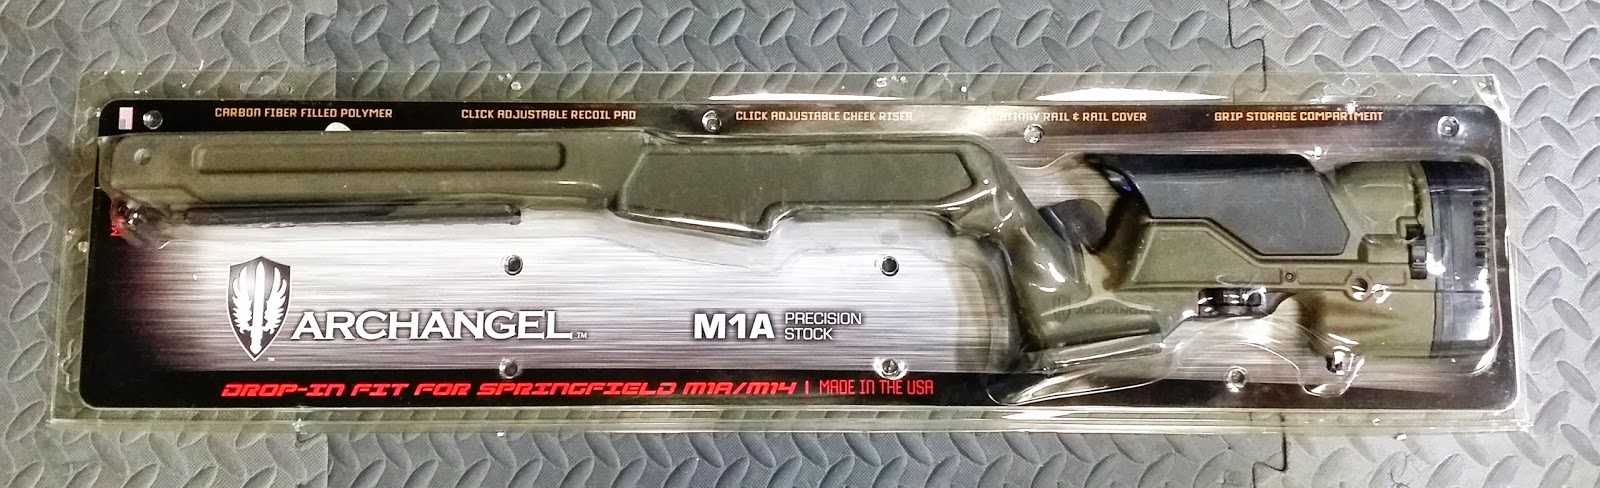 Mr Armageddons Project Log Springfield M1a Archangel Precision